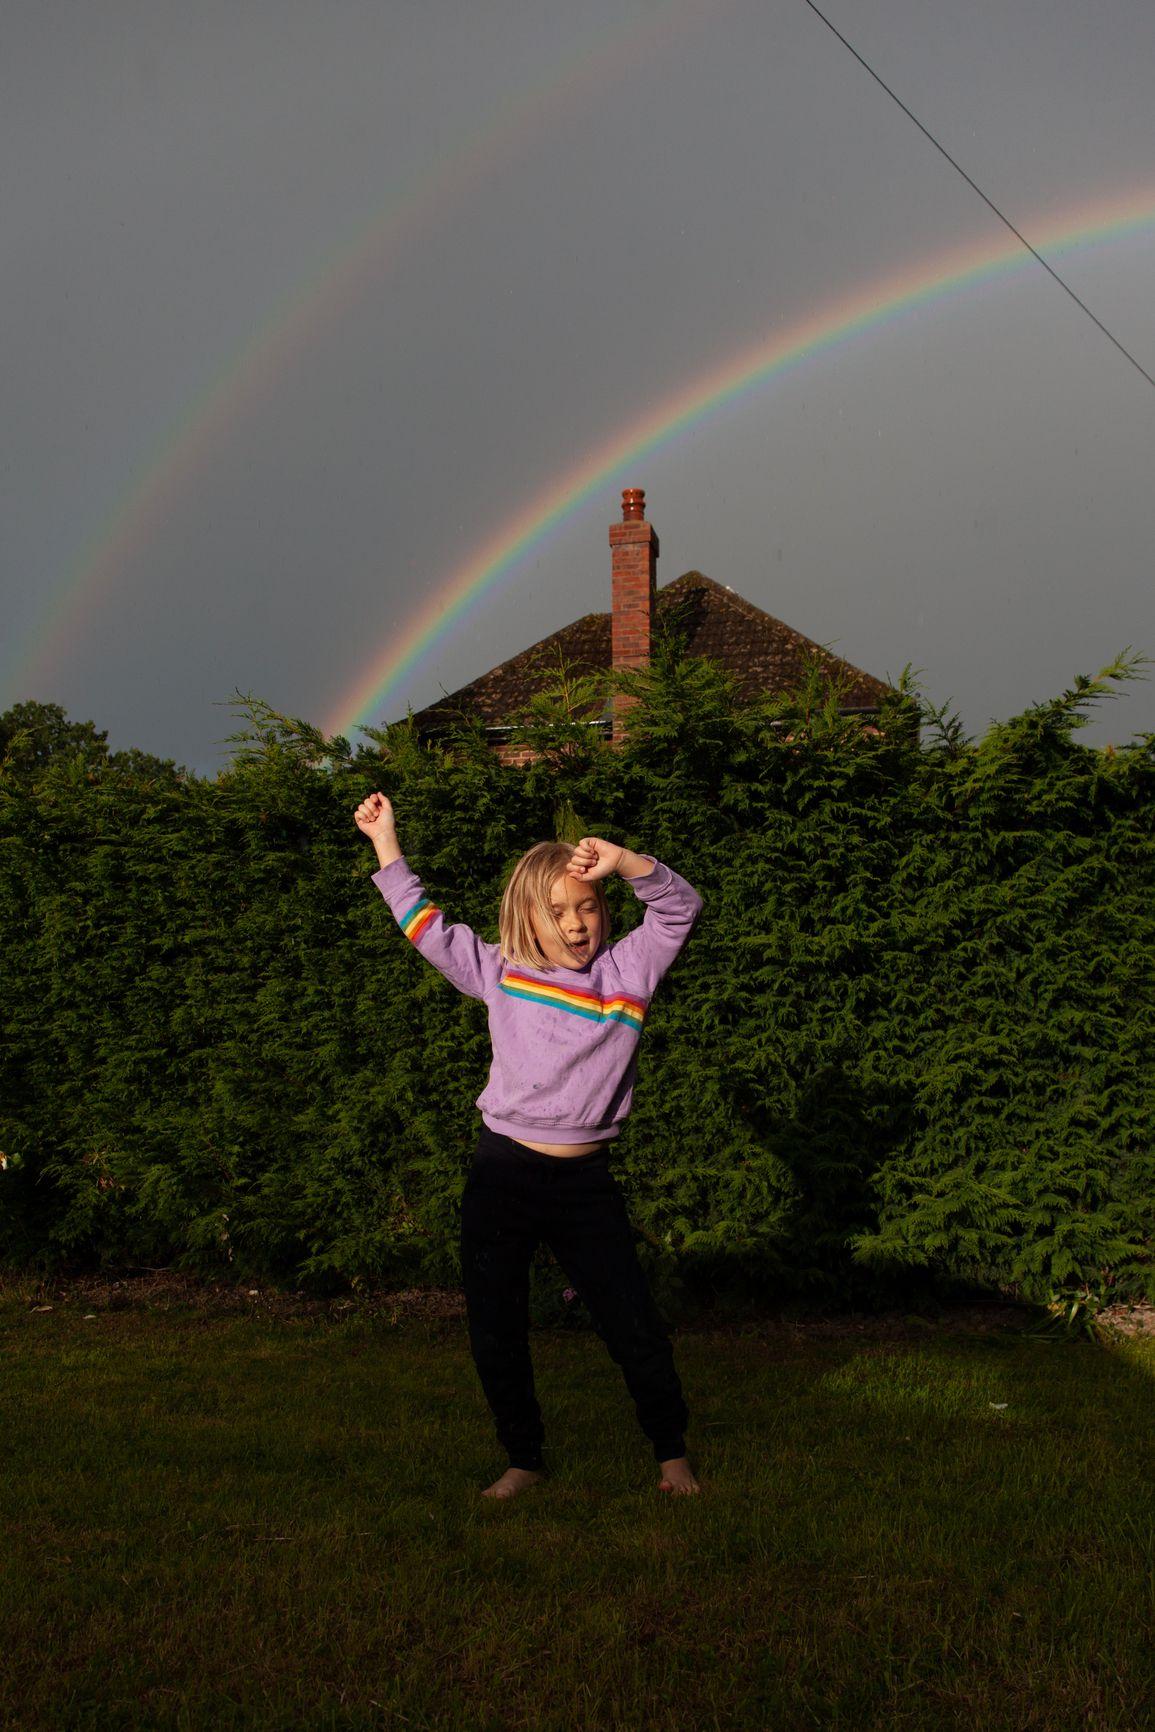 Rainbow Magic. A Girl Dances In The Rain.